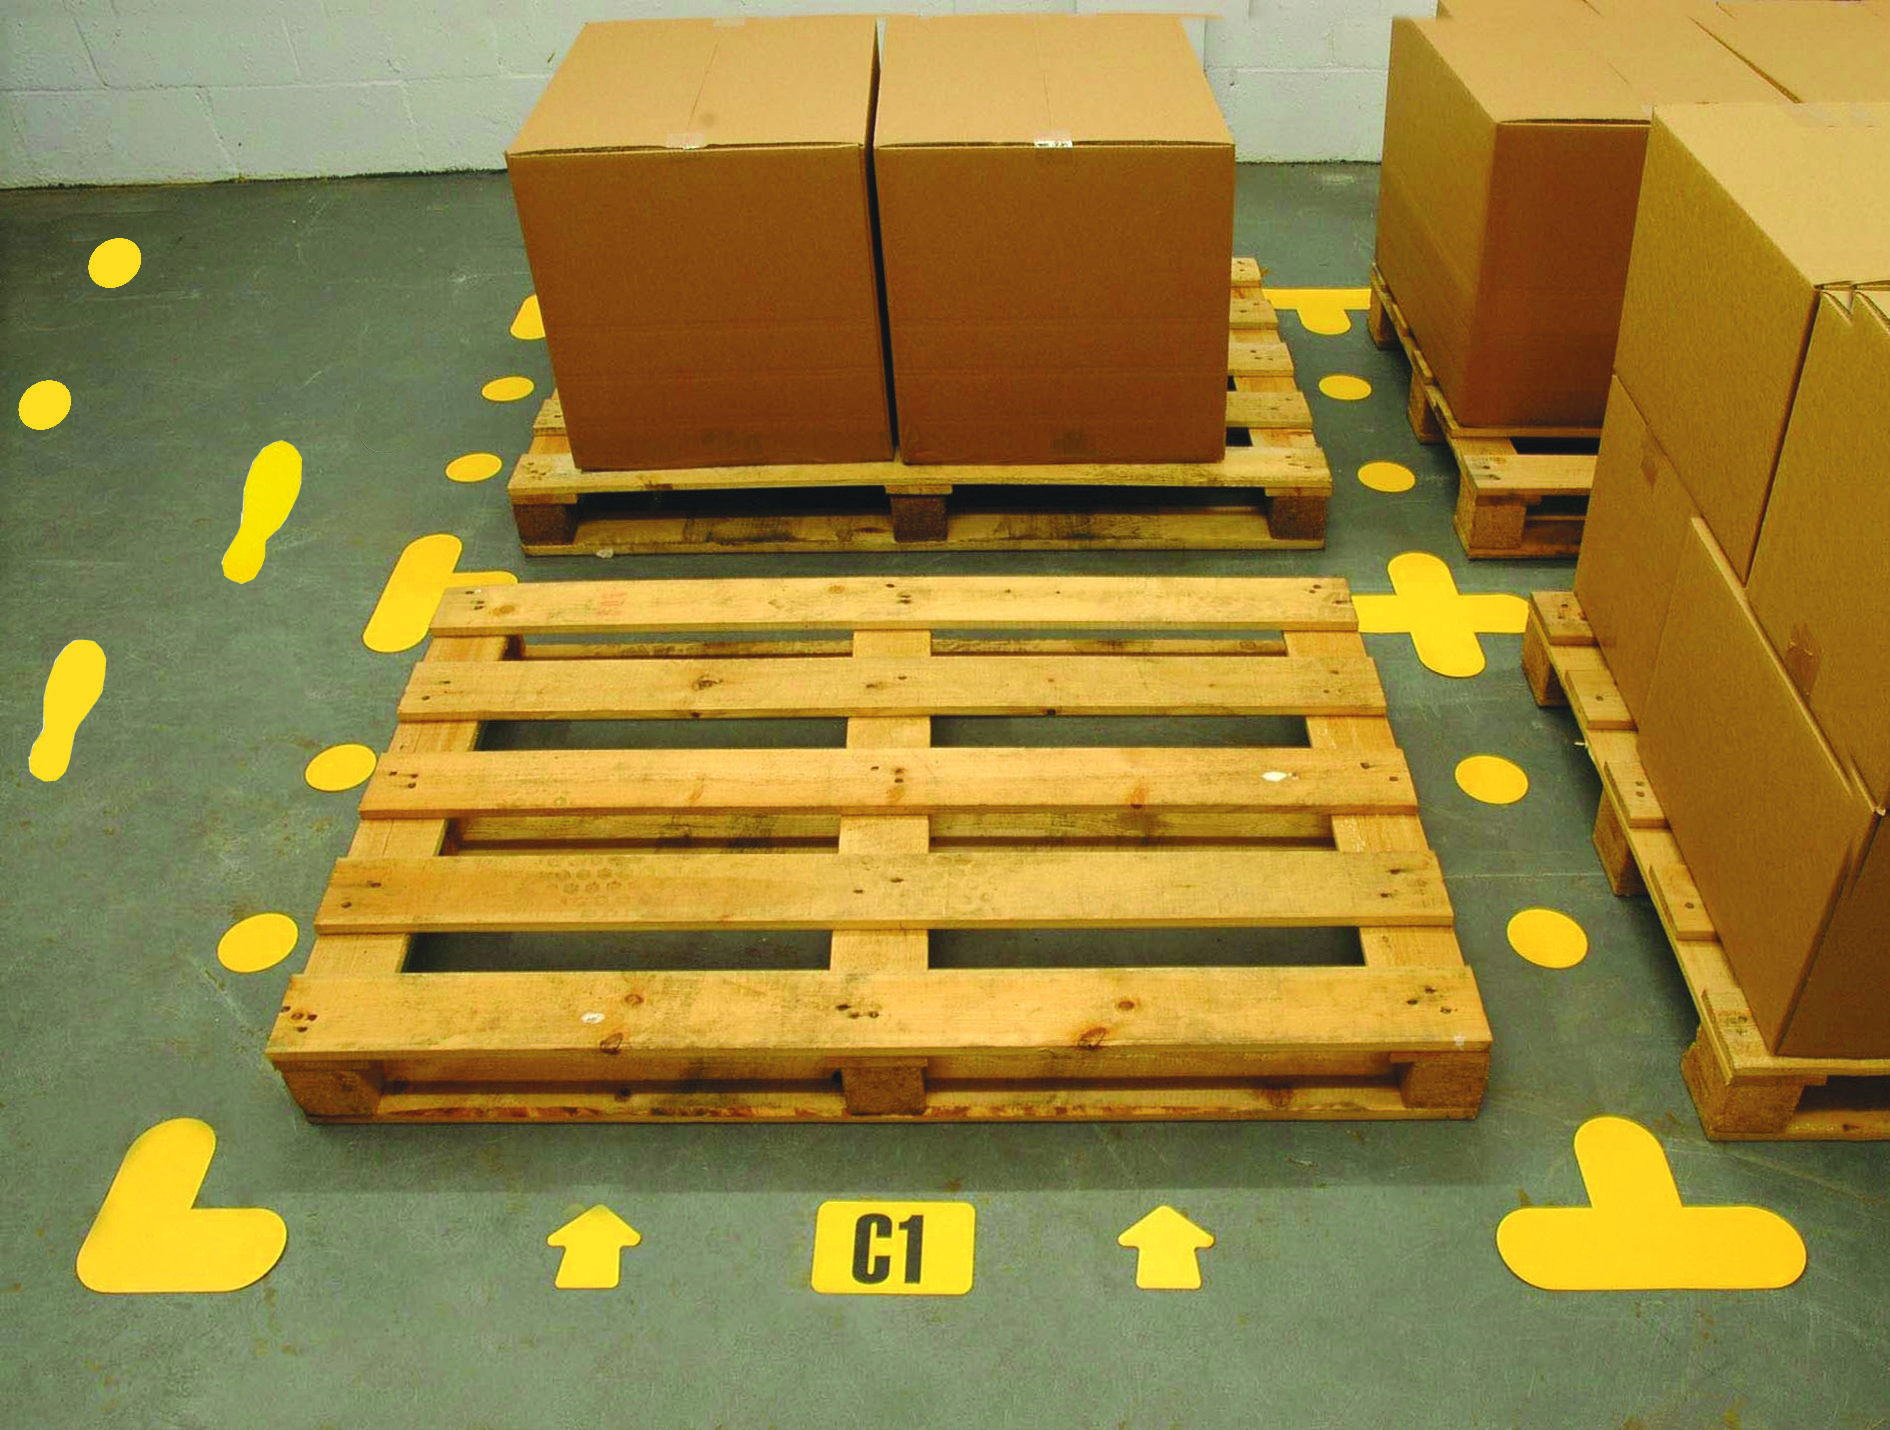 Floor Markings in use Warehouse floor, Warehouse